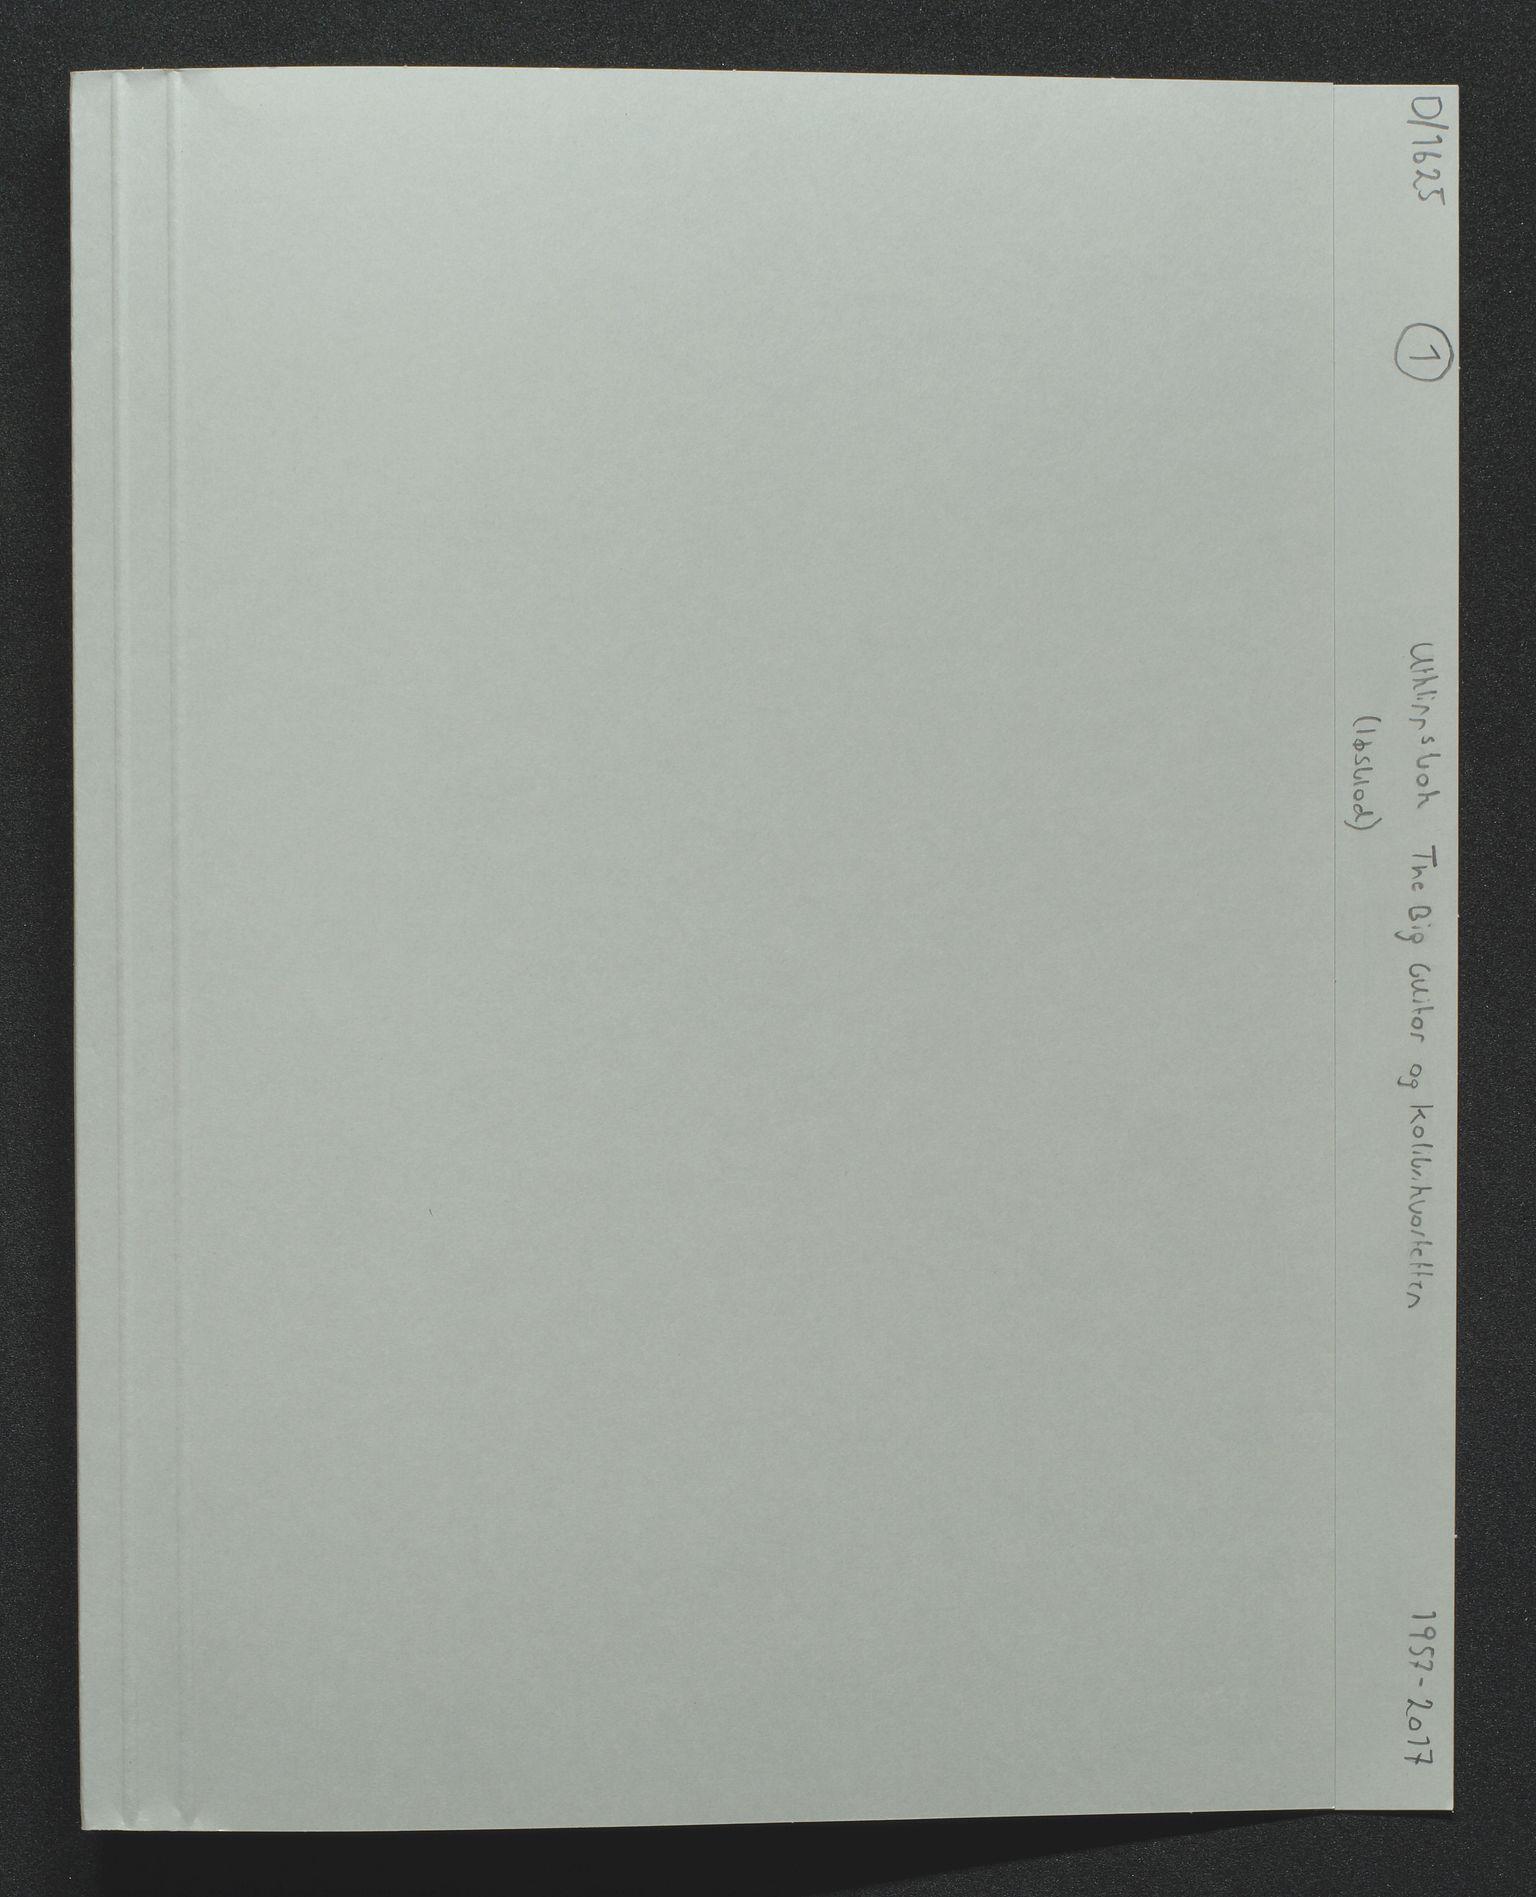 SAK, The Big Guitar og Kolibrikvartetten, Z/Za/L0001: Utklippsbøker, 1957-2018, s. 1